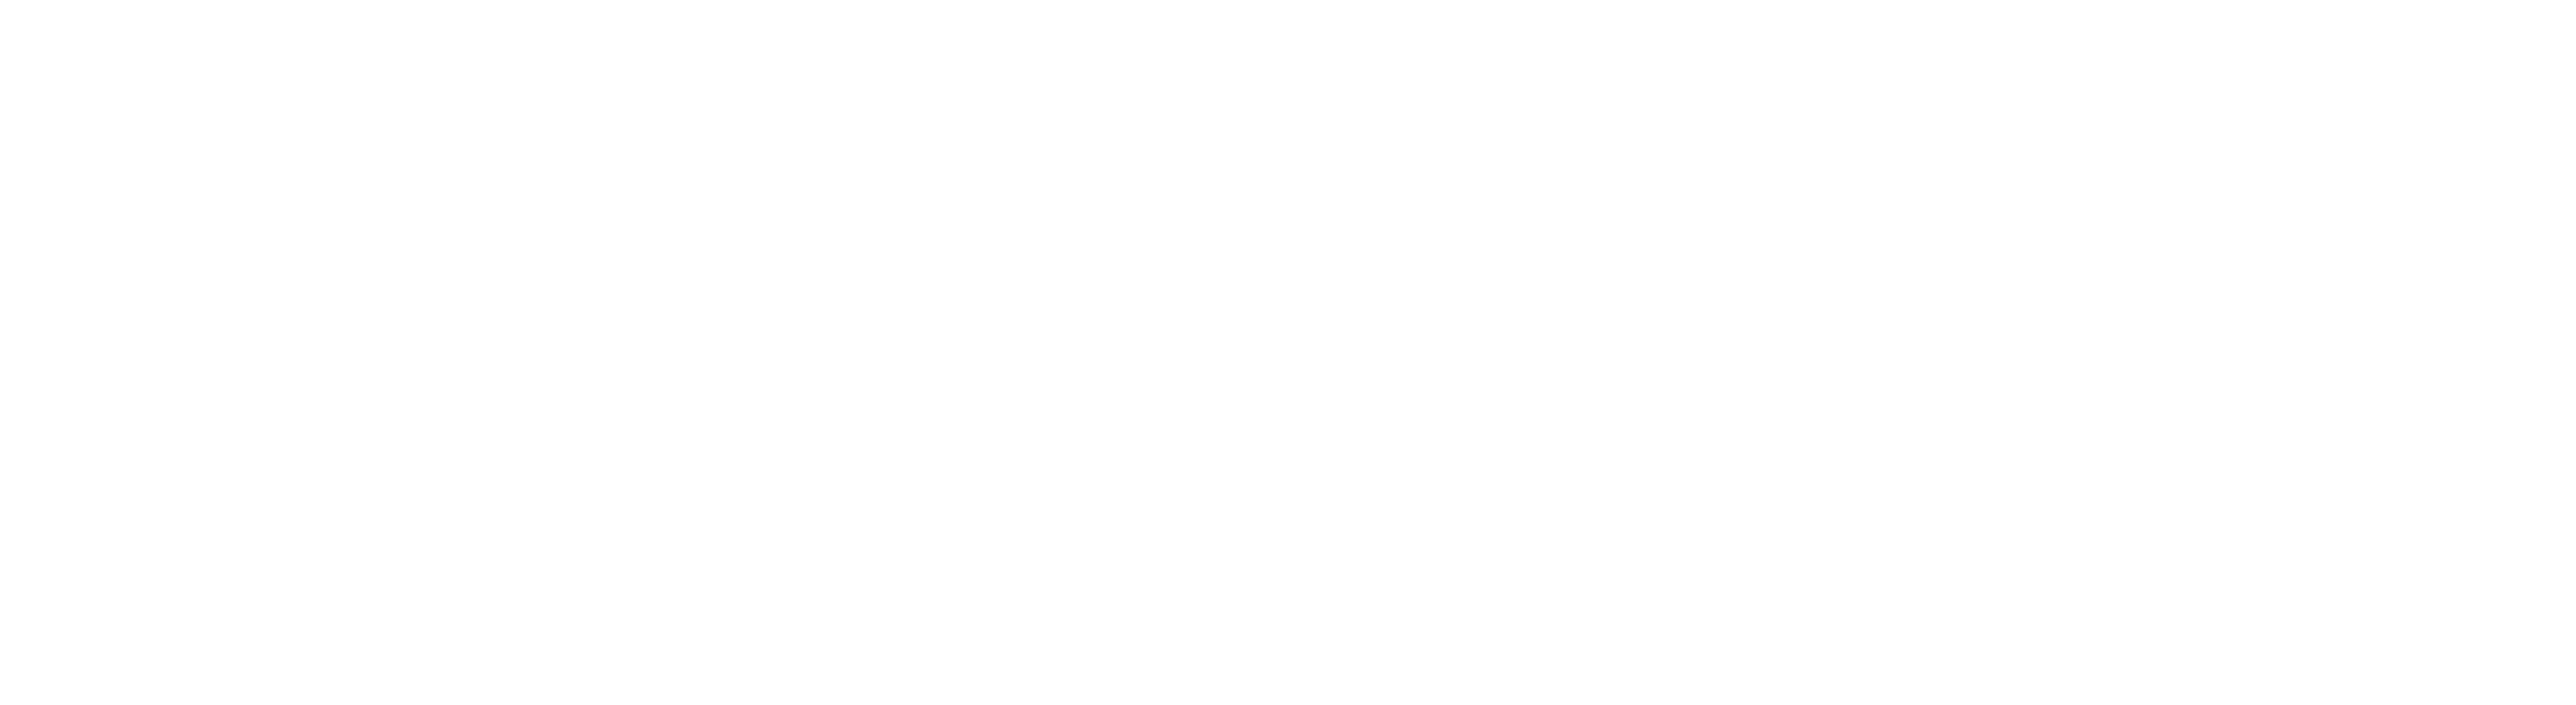 TrustQuay logo White